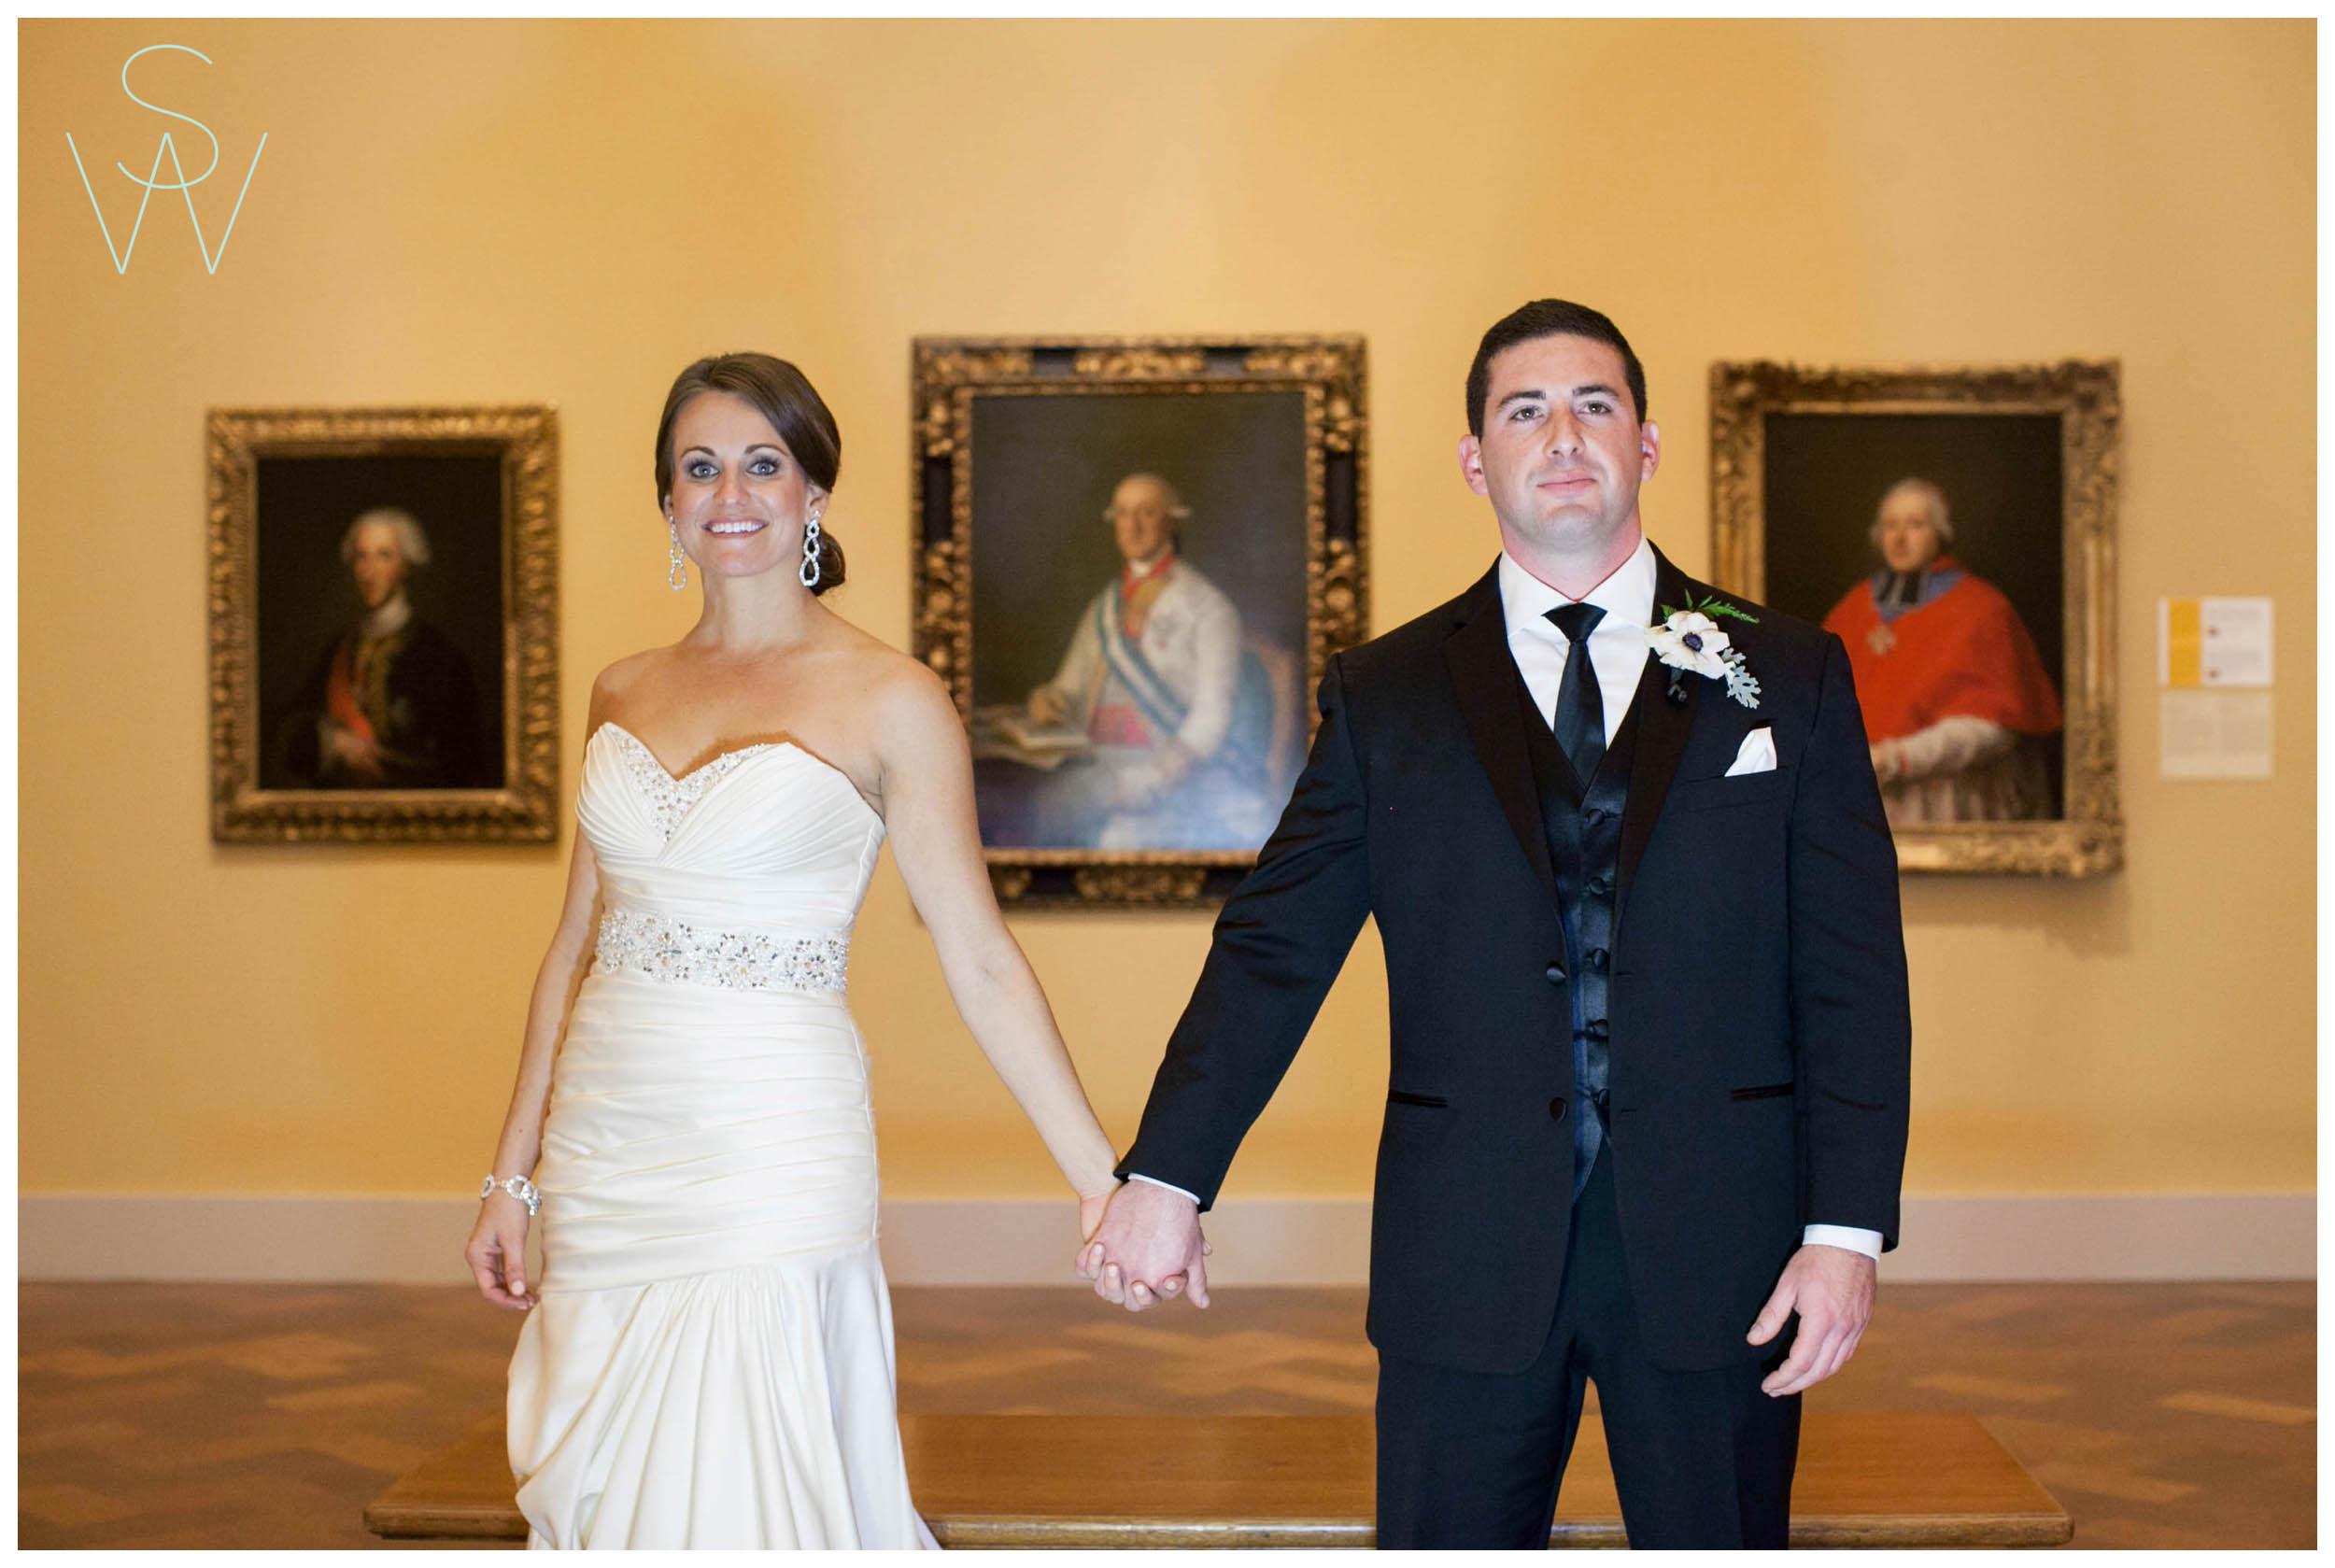 Shewanders.sdma_.wedding.photography-1076.jpg.wedding.photography-1076.jpg